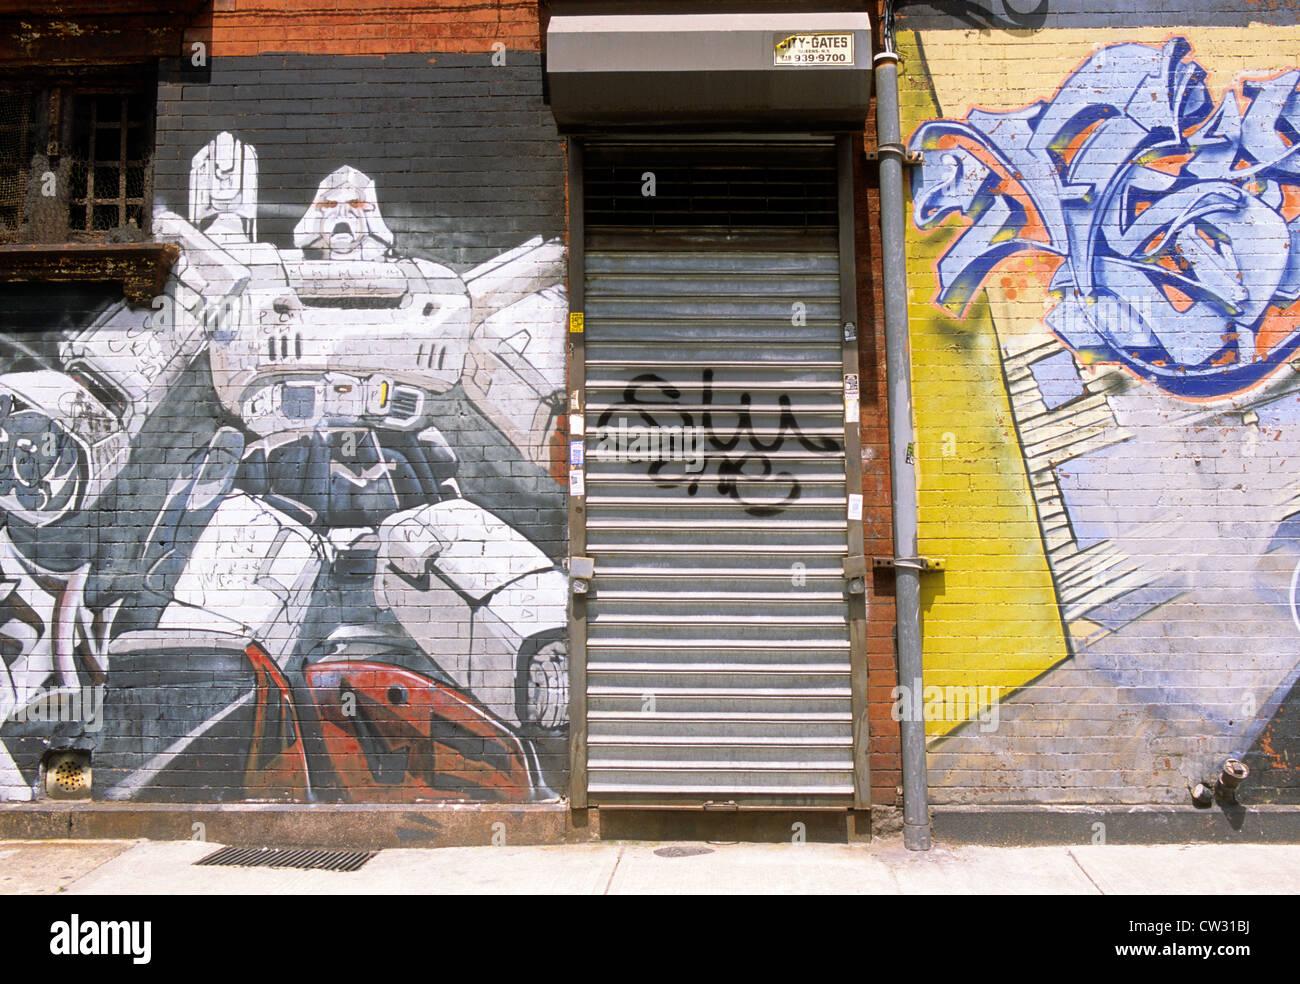 Graffiti wall painting - New York East Spanish Harlem Graffiti Wall Painting In The Barrio Usa